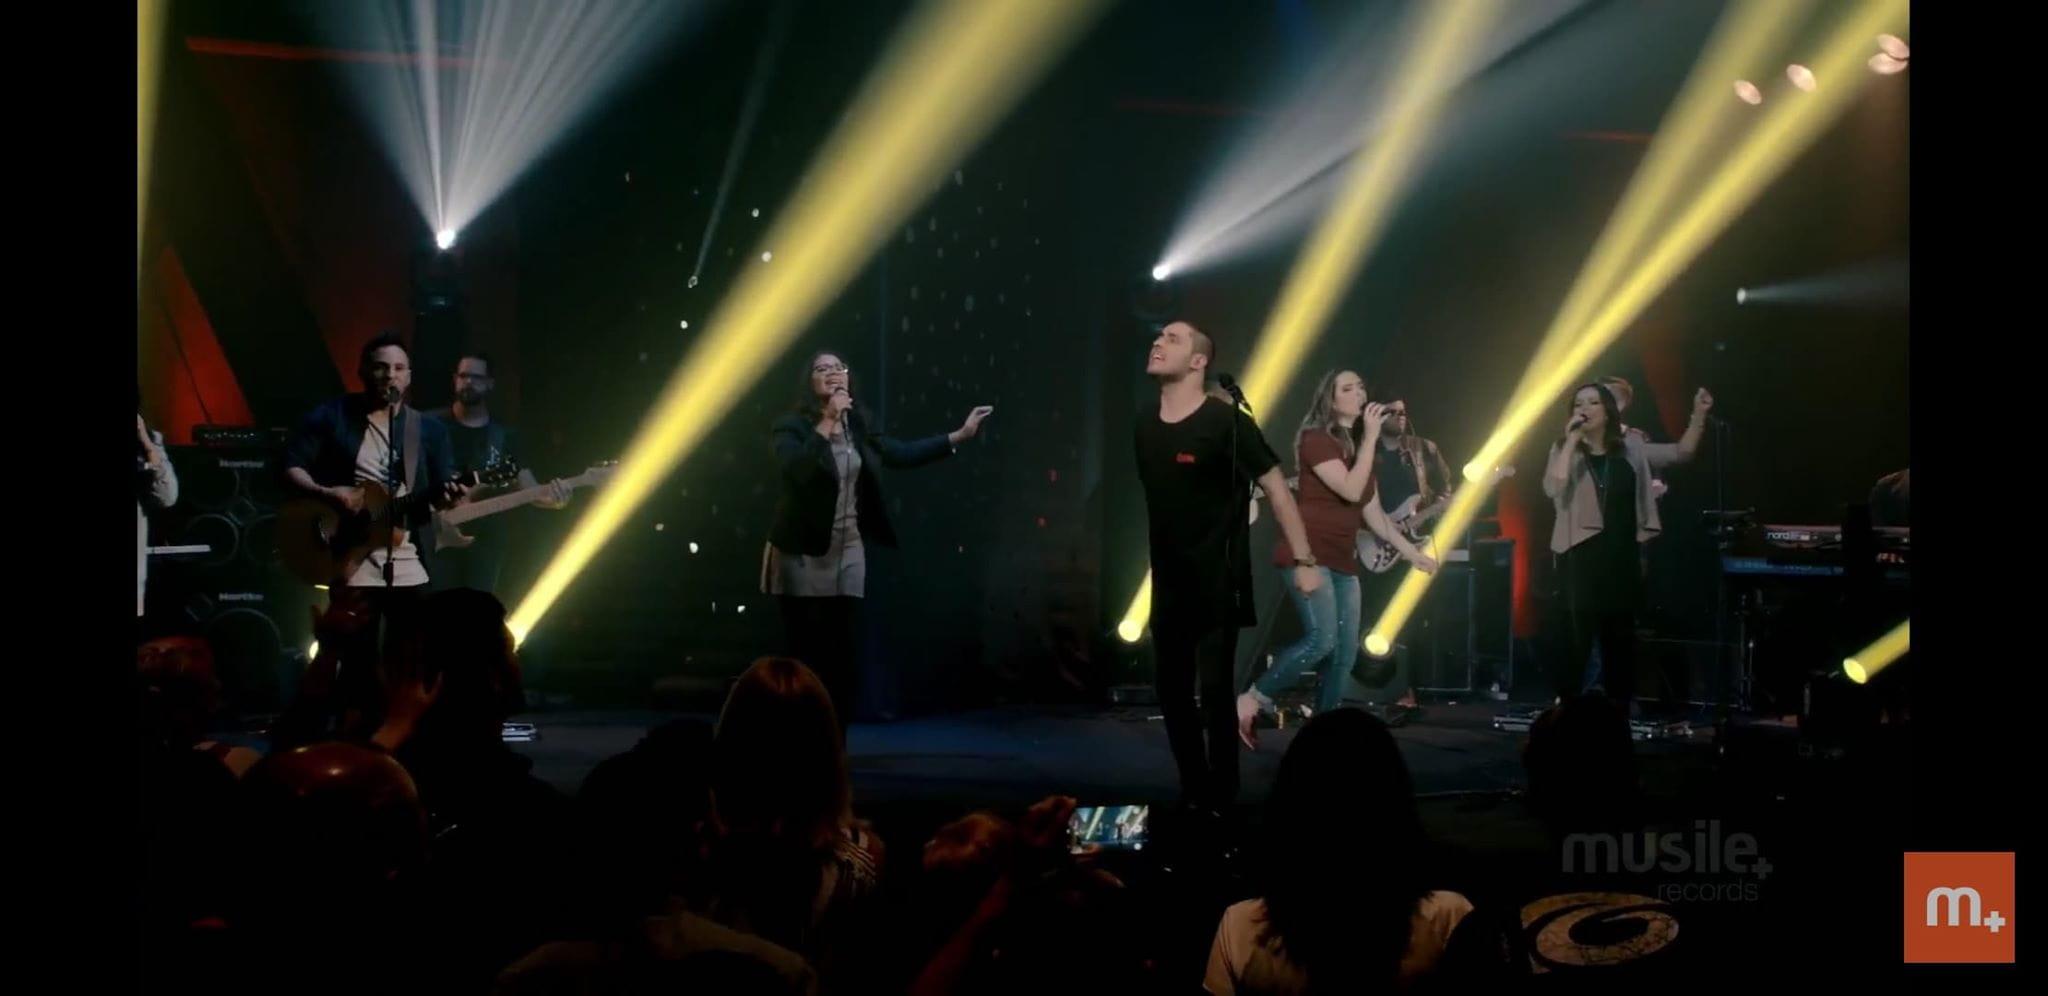 Musile Records | ADAI Music apresenta Preço de Sangue (ao vivo)